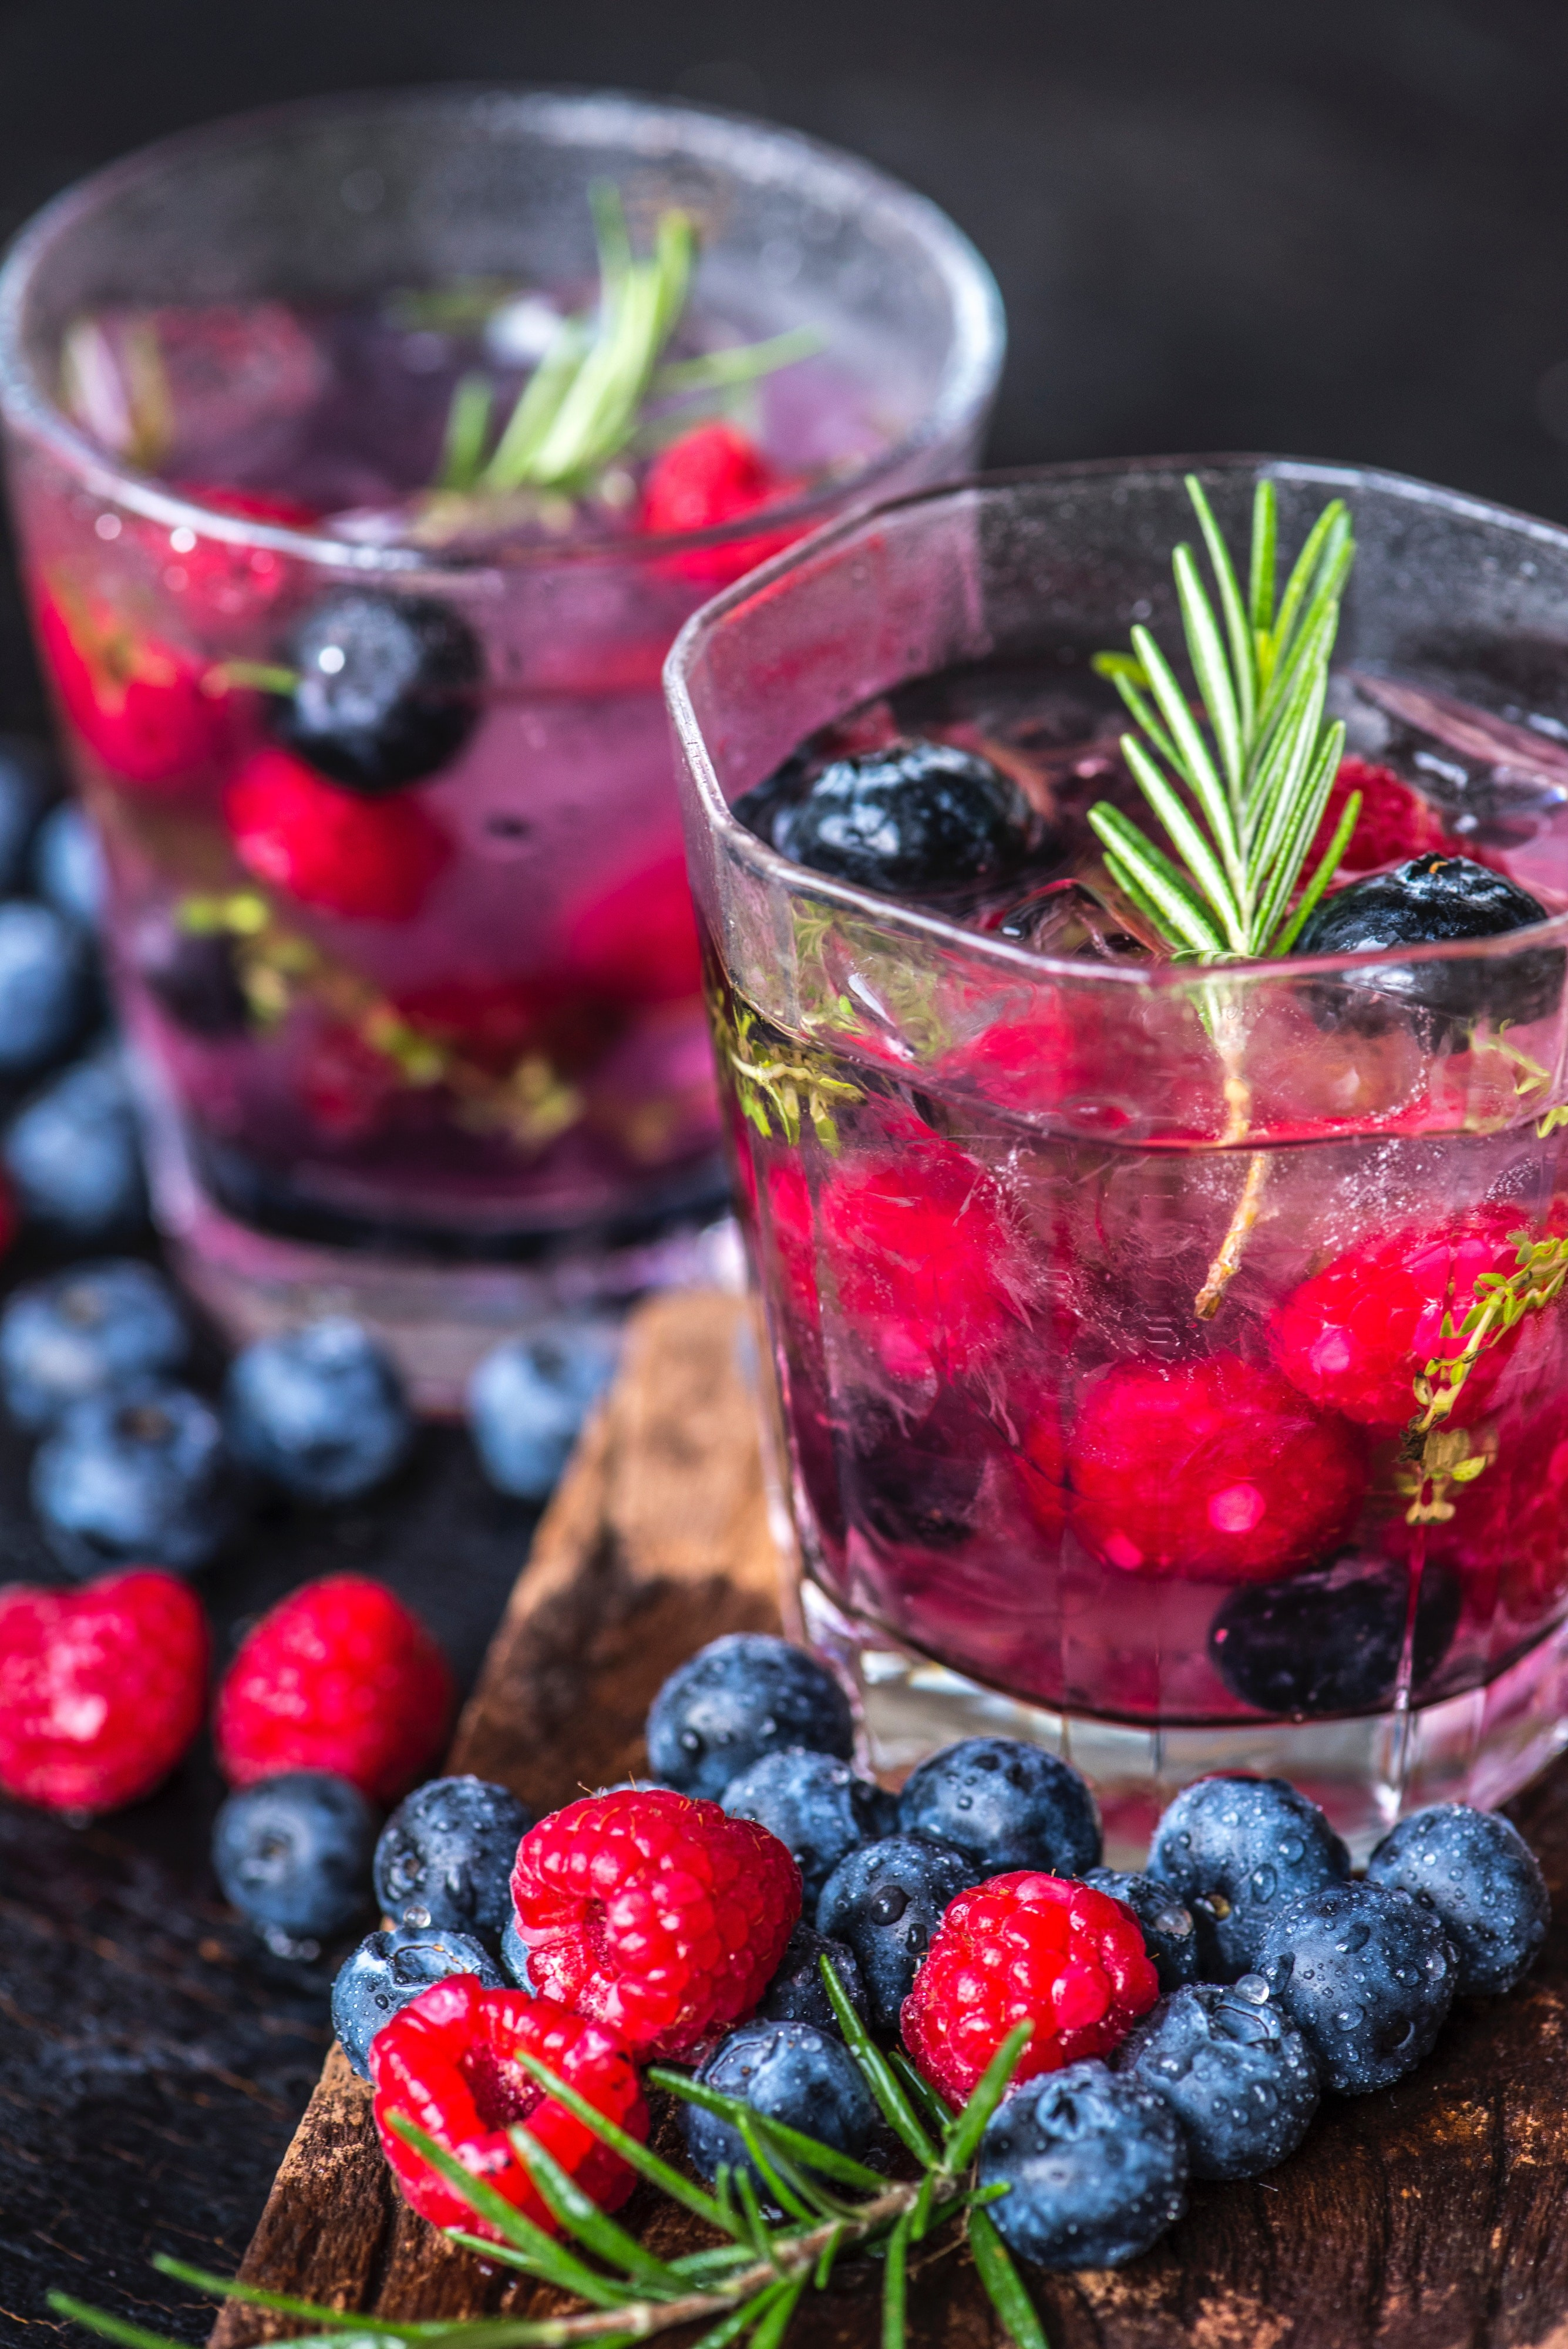 Novo suco da beleza tem ingredientes antioxidantes  (Foto: Unsplash)